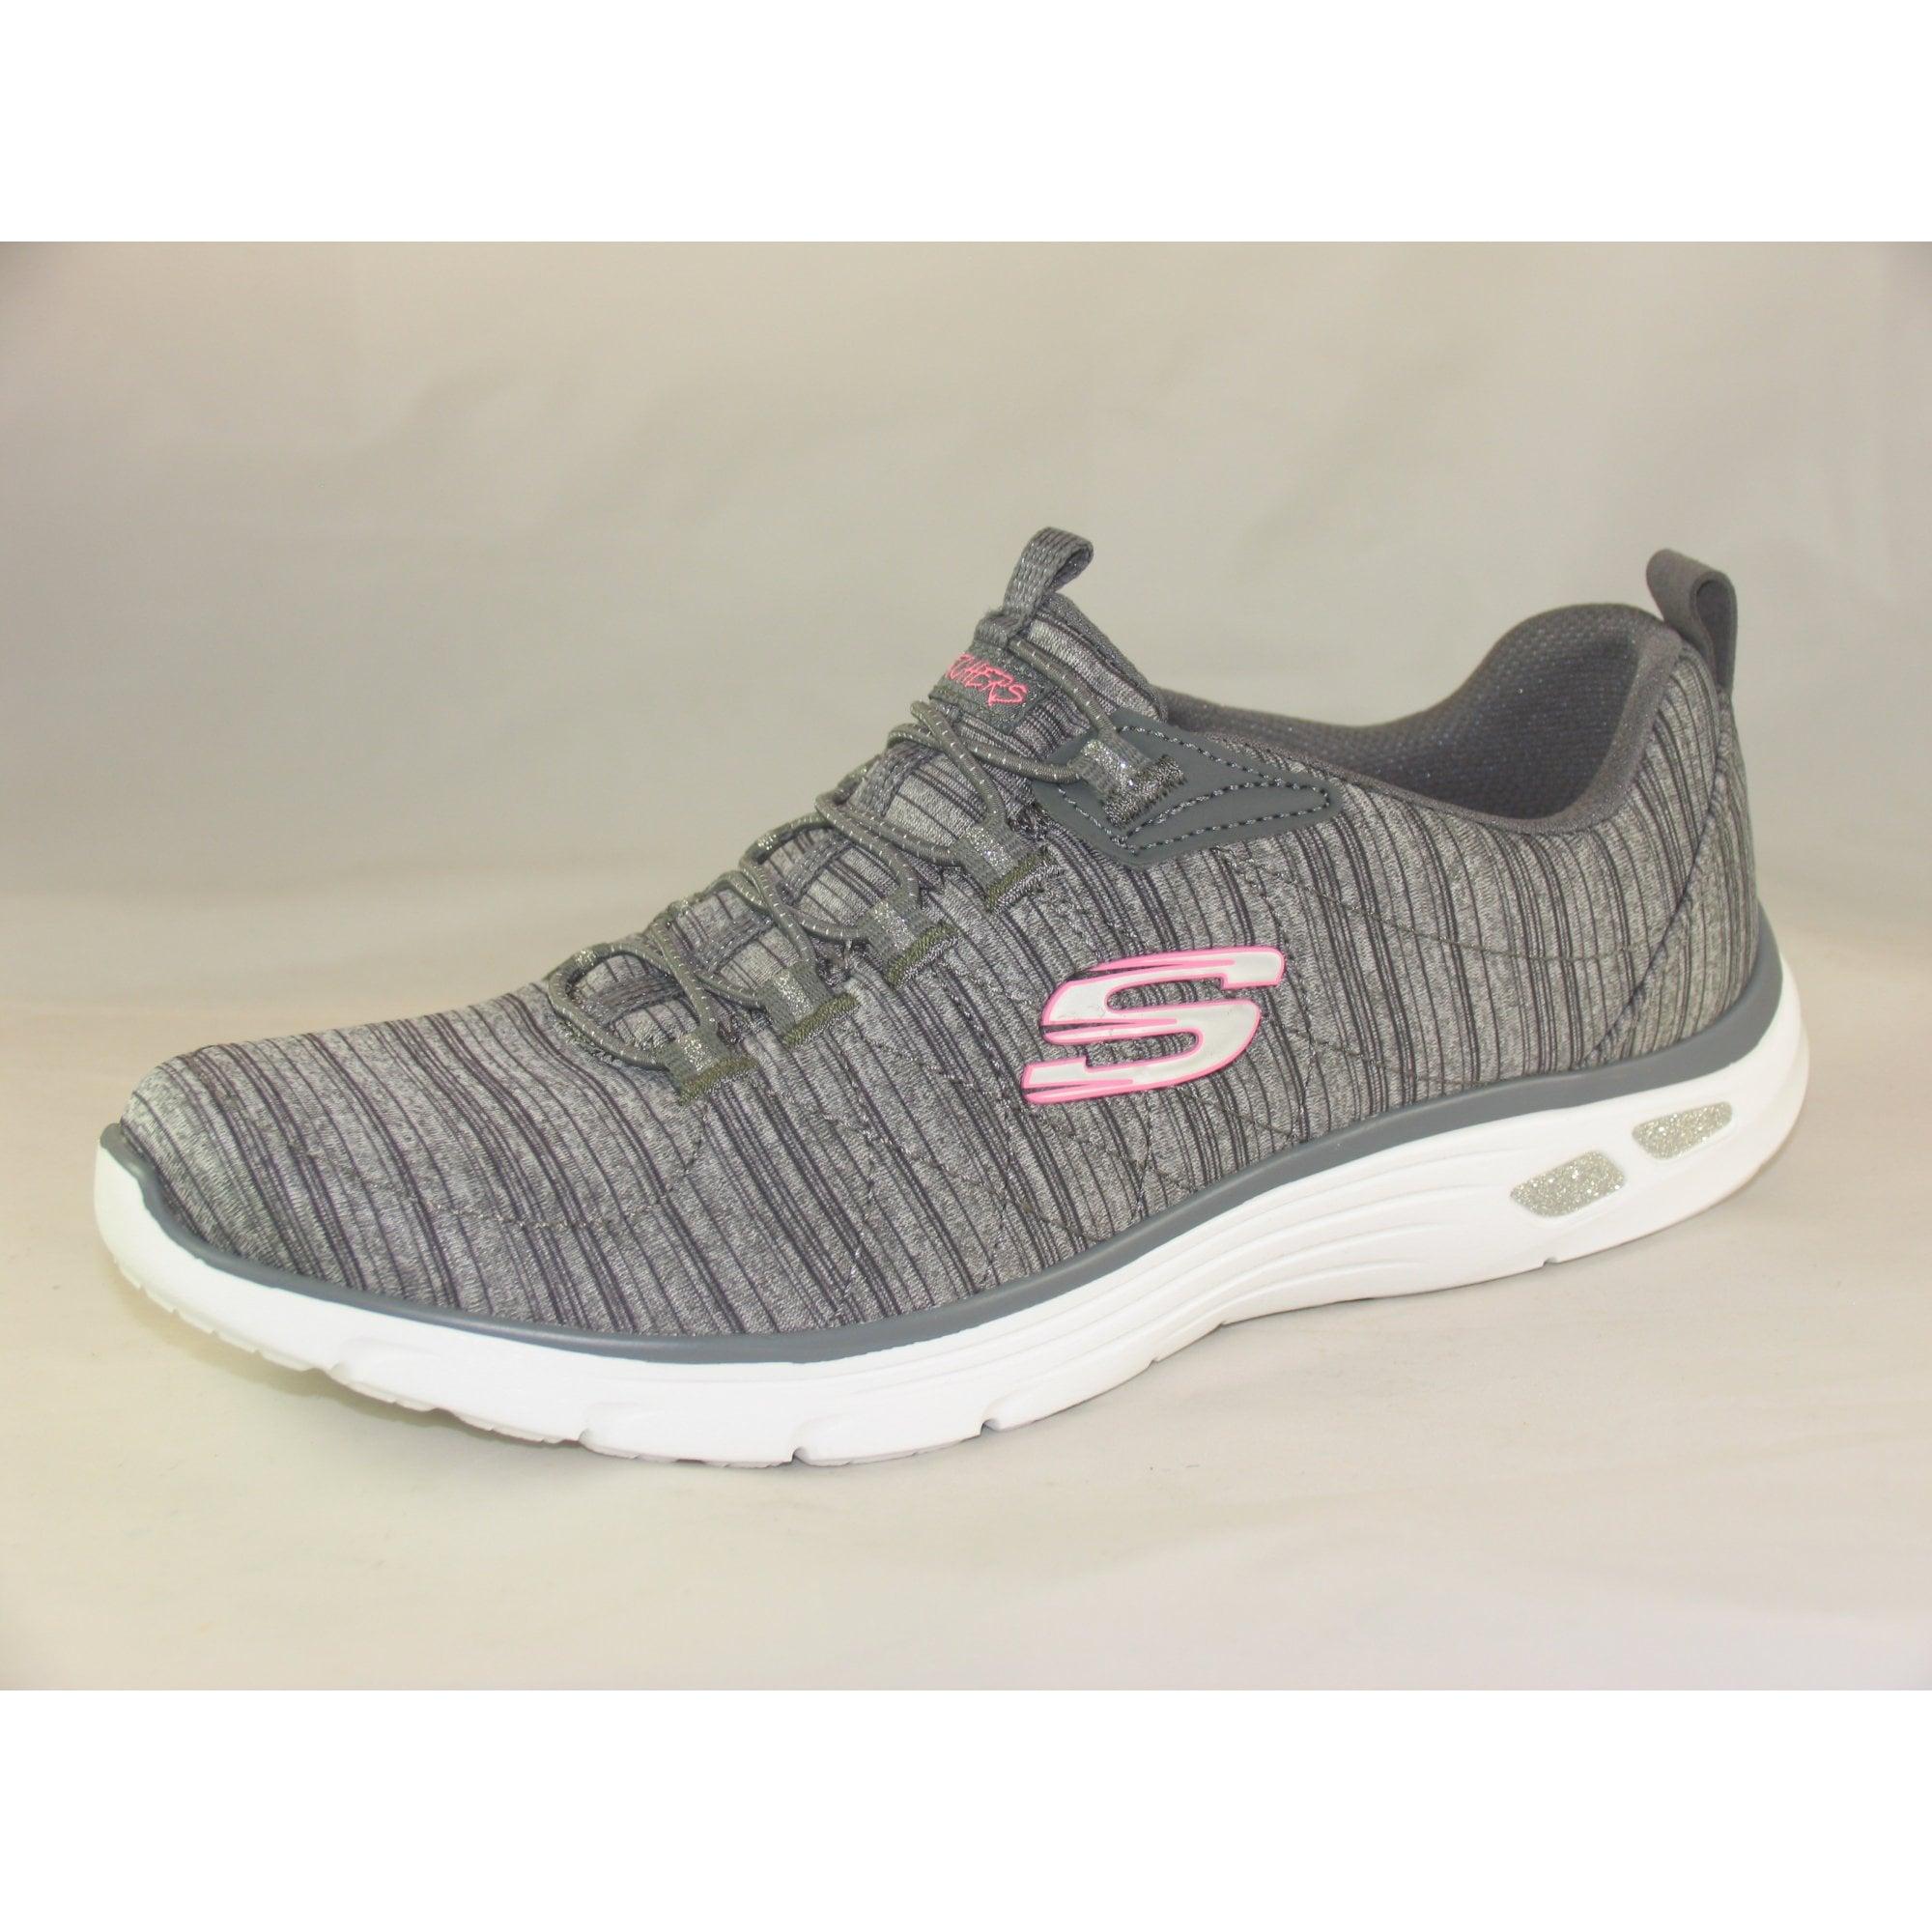 skechers slip on trainers